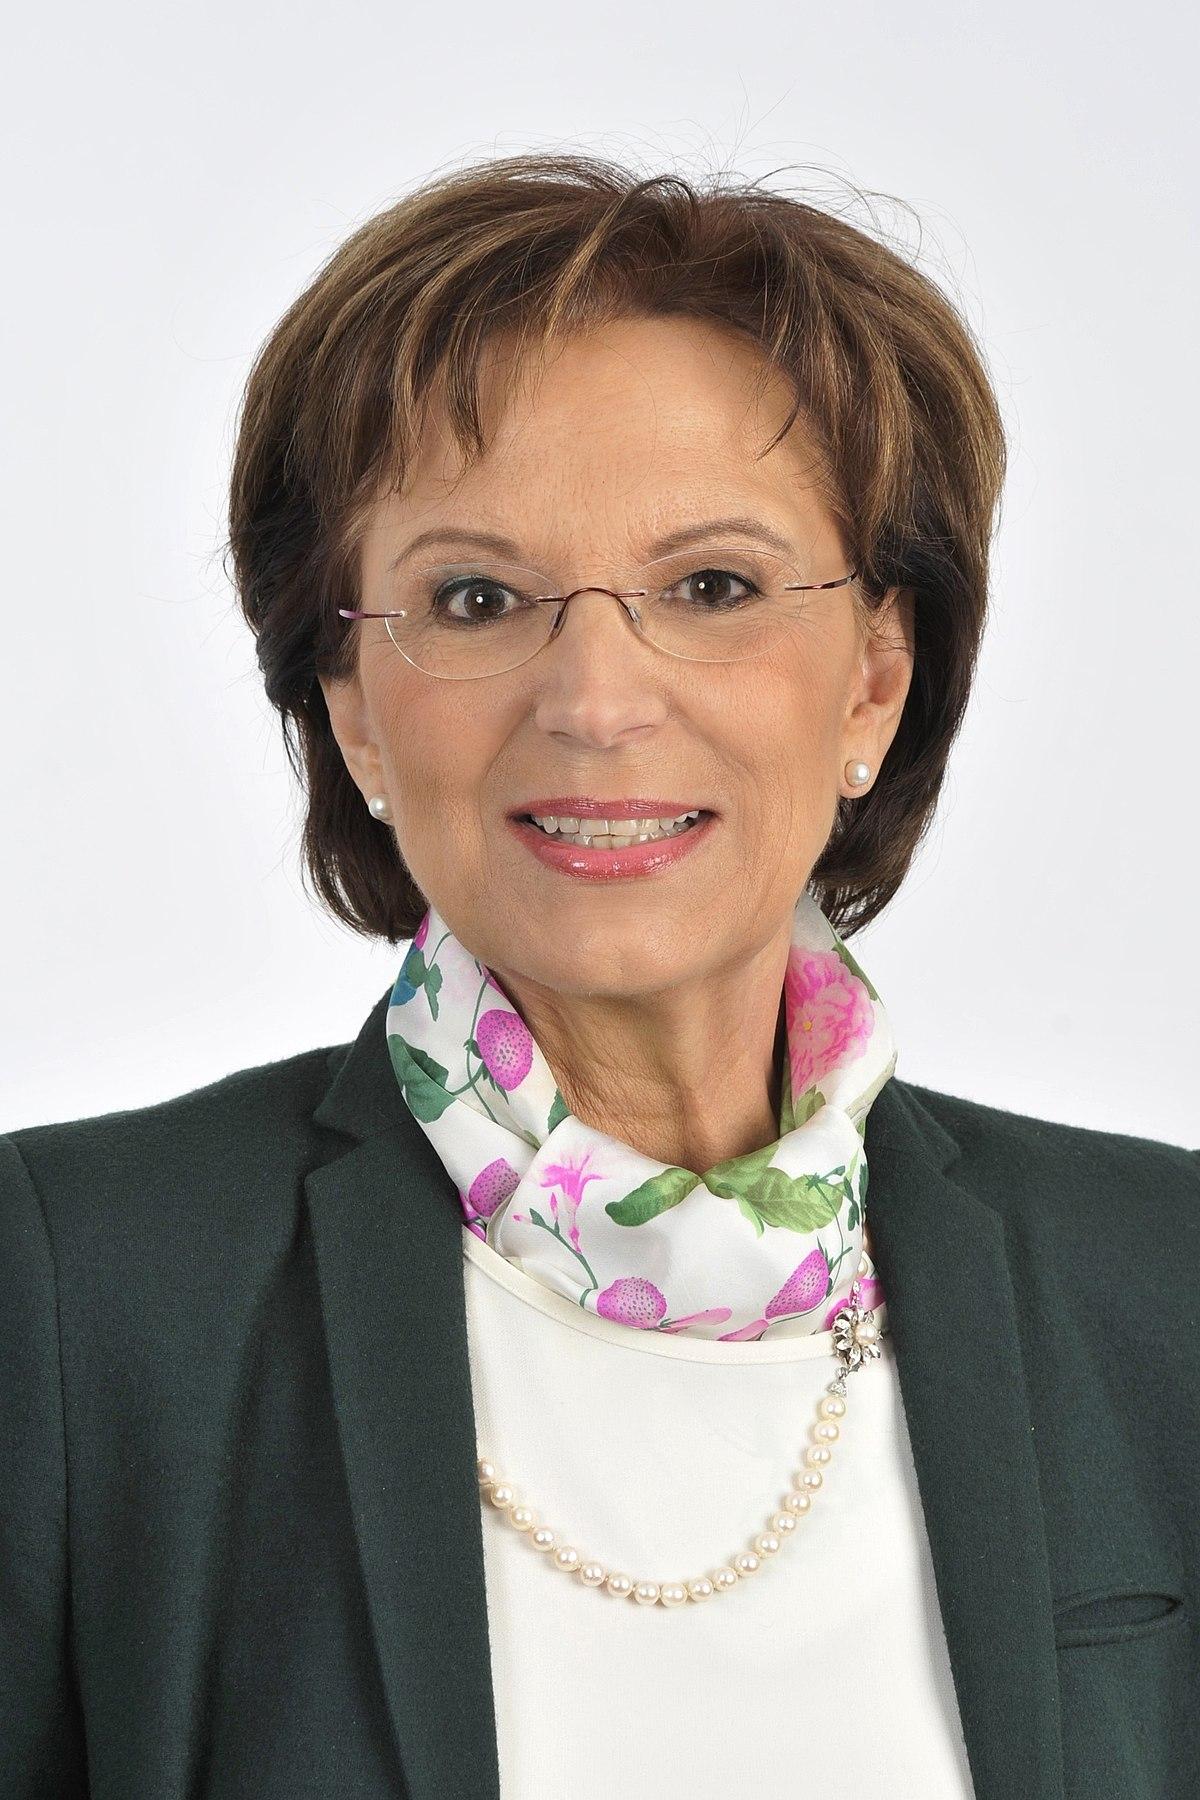 Emilia Müller –